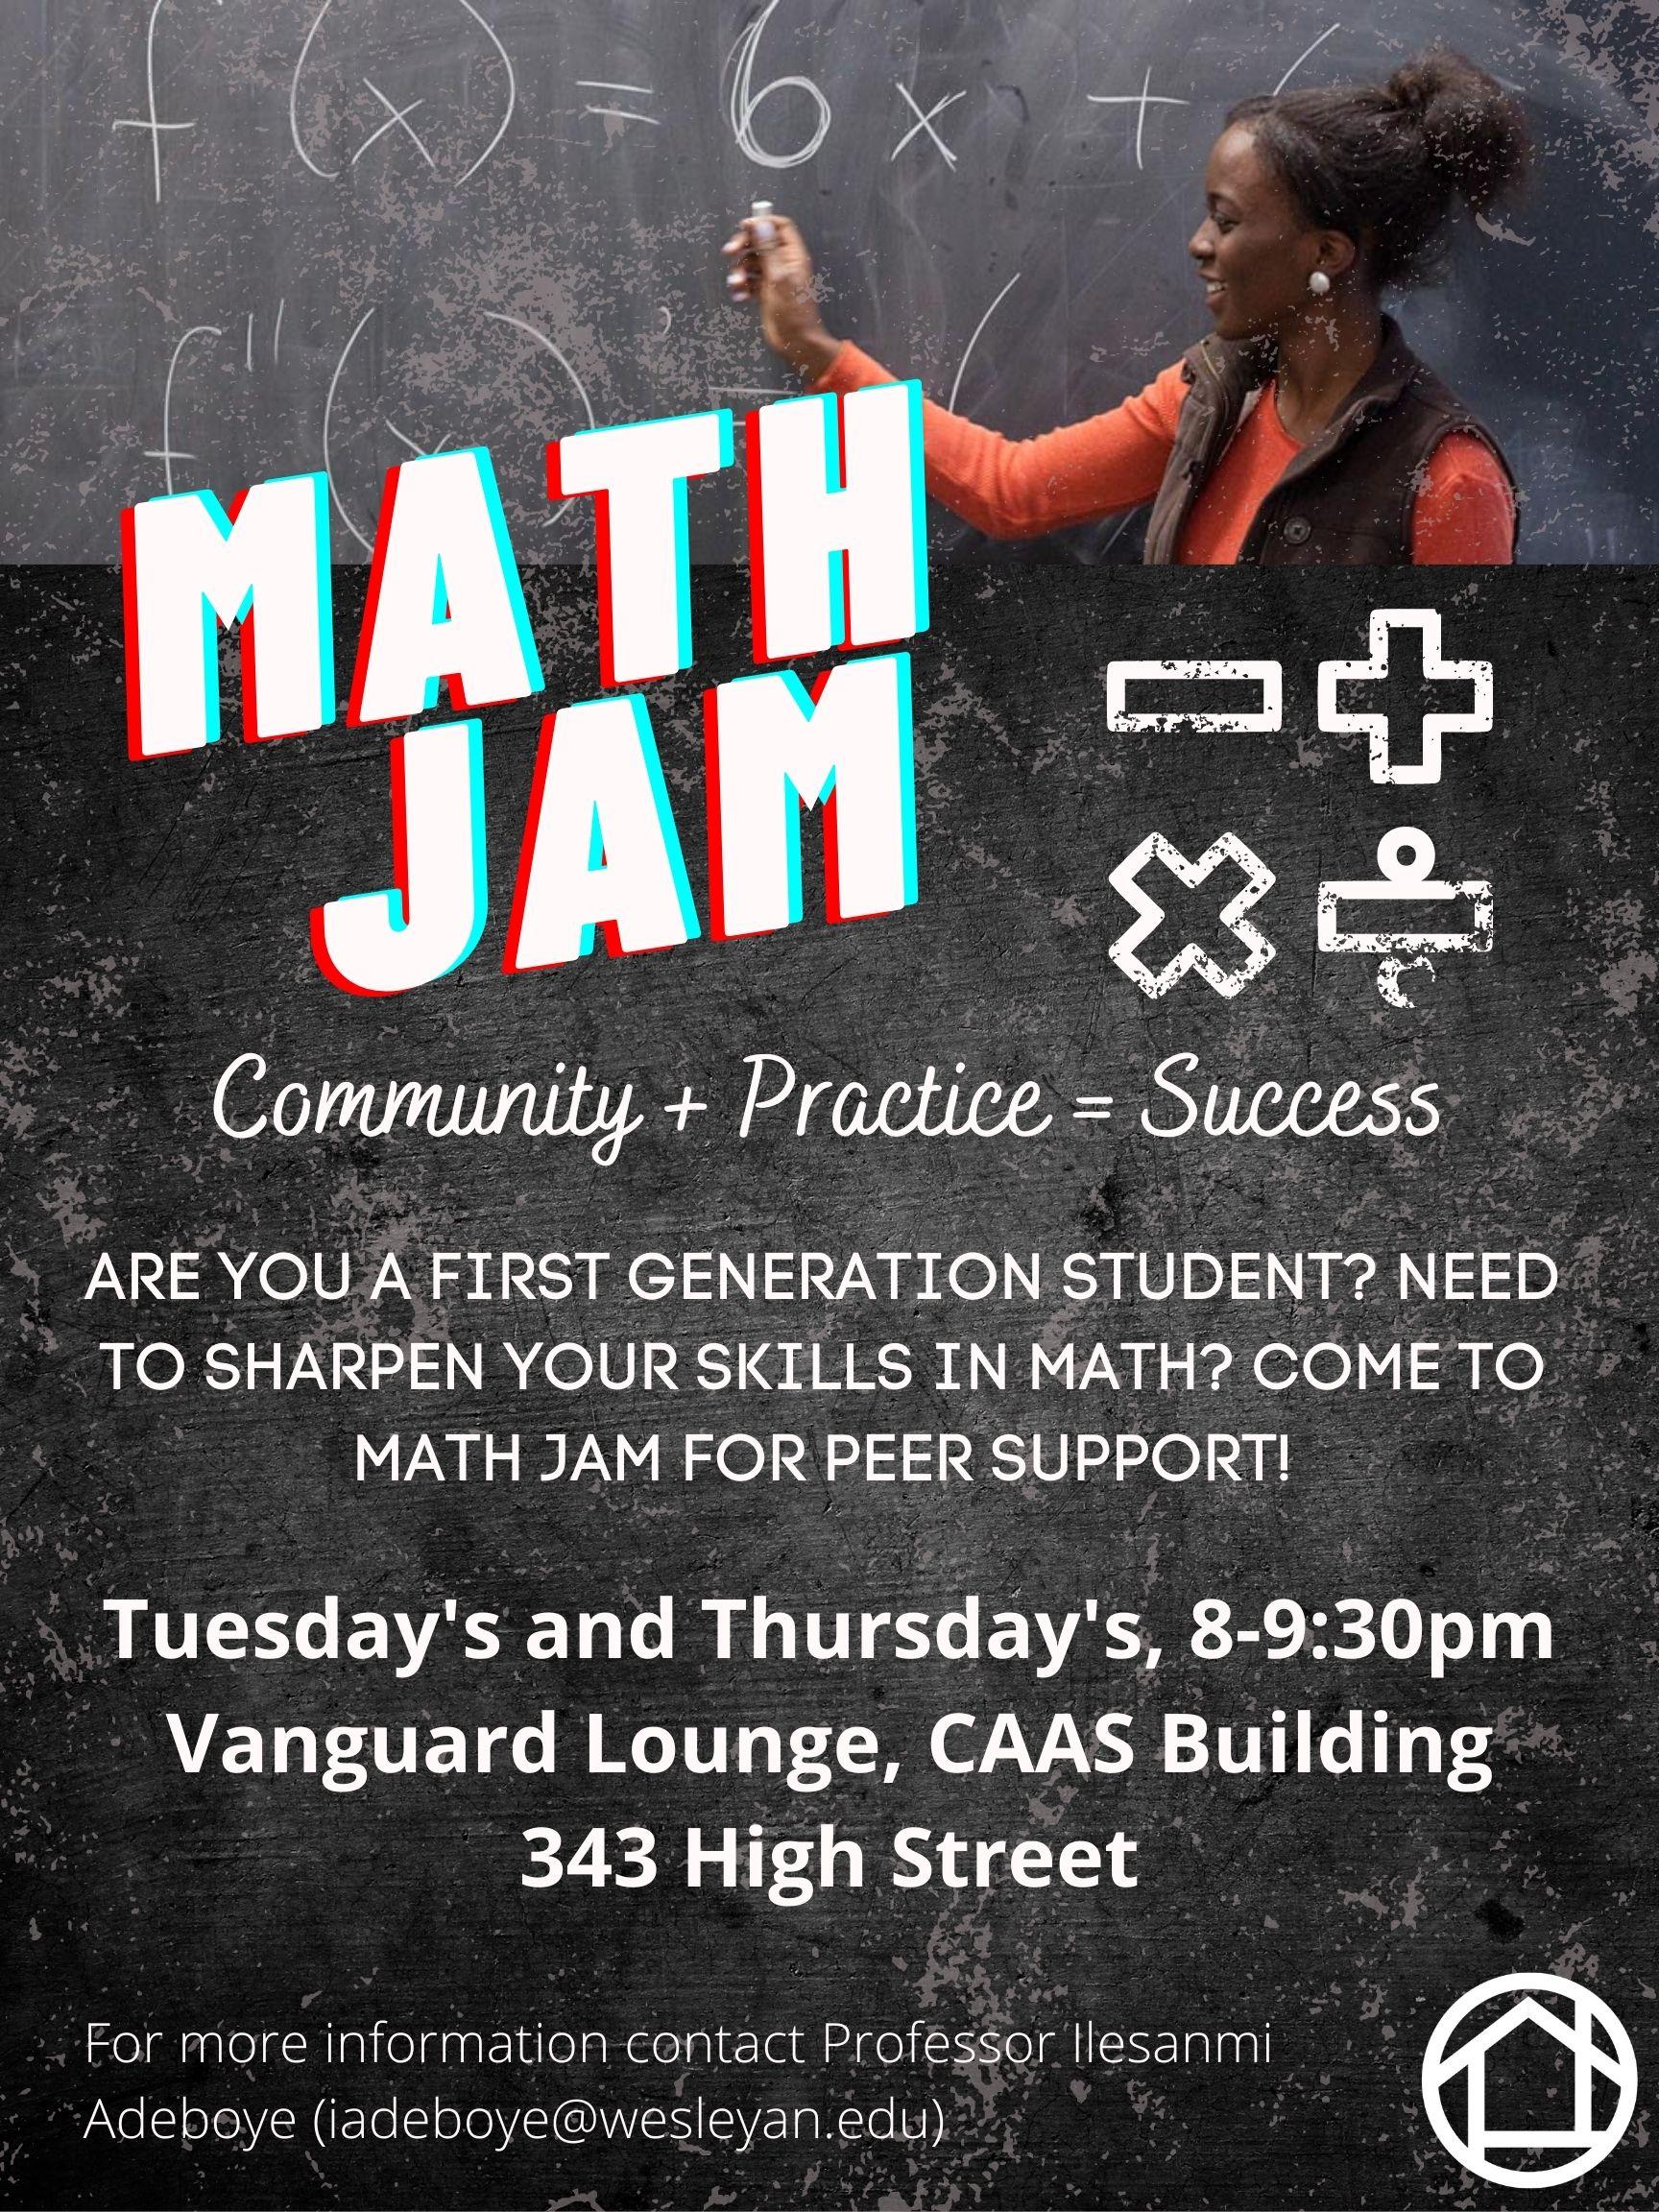 Math Jam.  Tuesdays and Thursdays 8-9:30pm, Vanguard Lounge, CAAS Building, 343 High Street